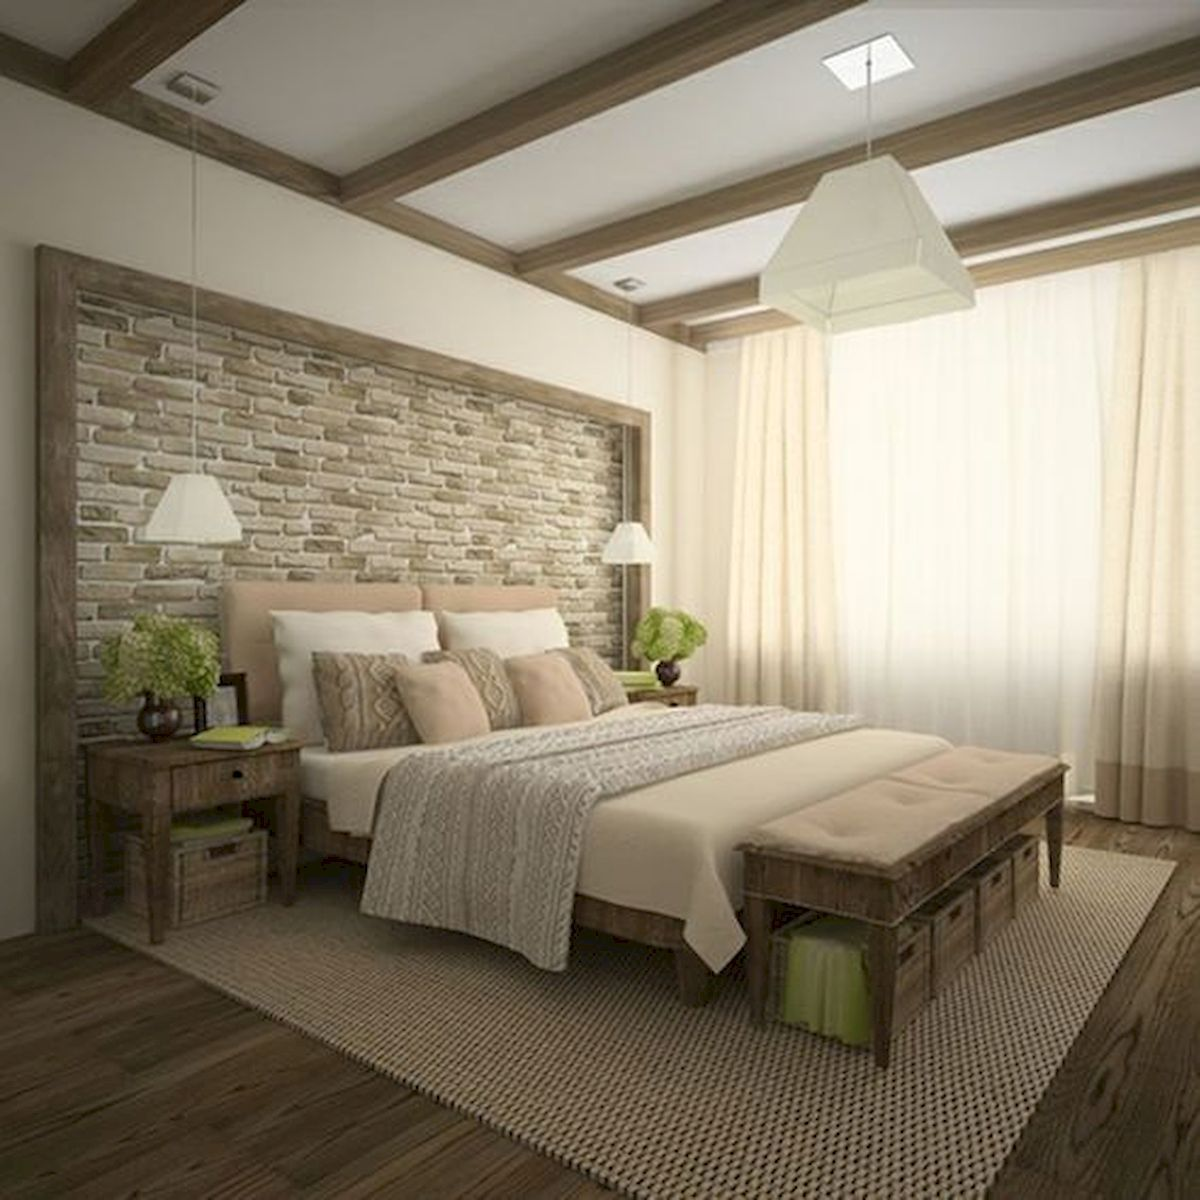 120 Awesome Farmhouse Master Bedroom Decor Ideas